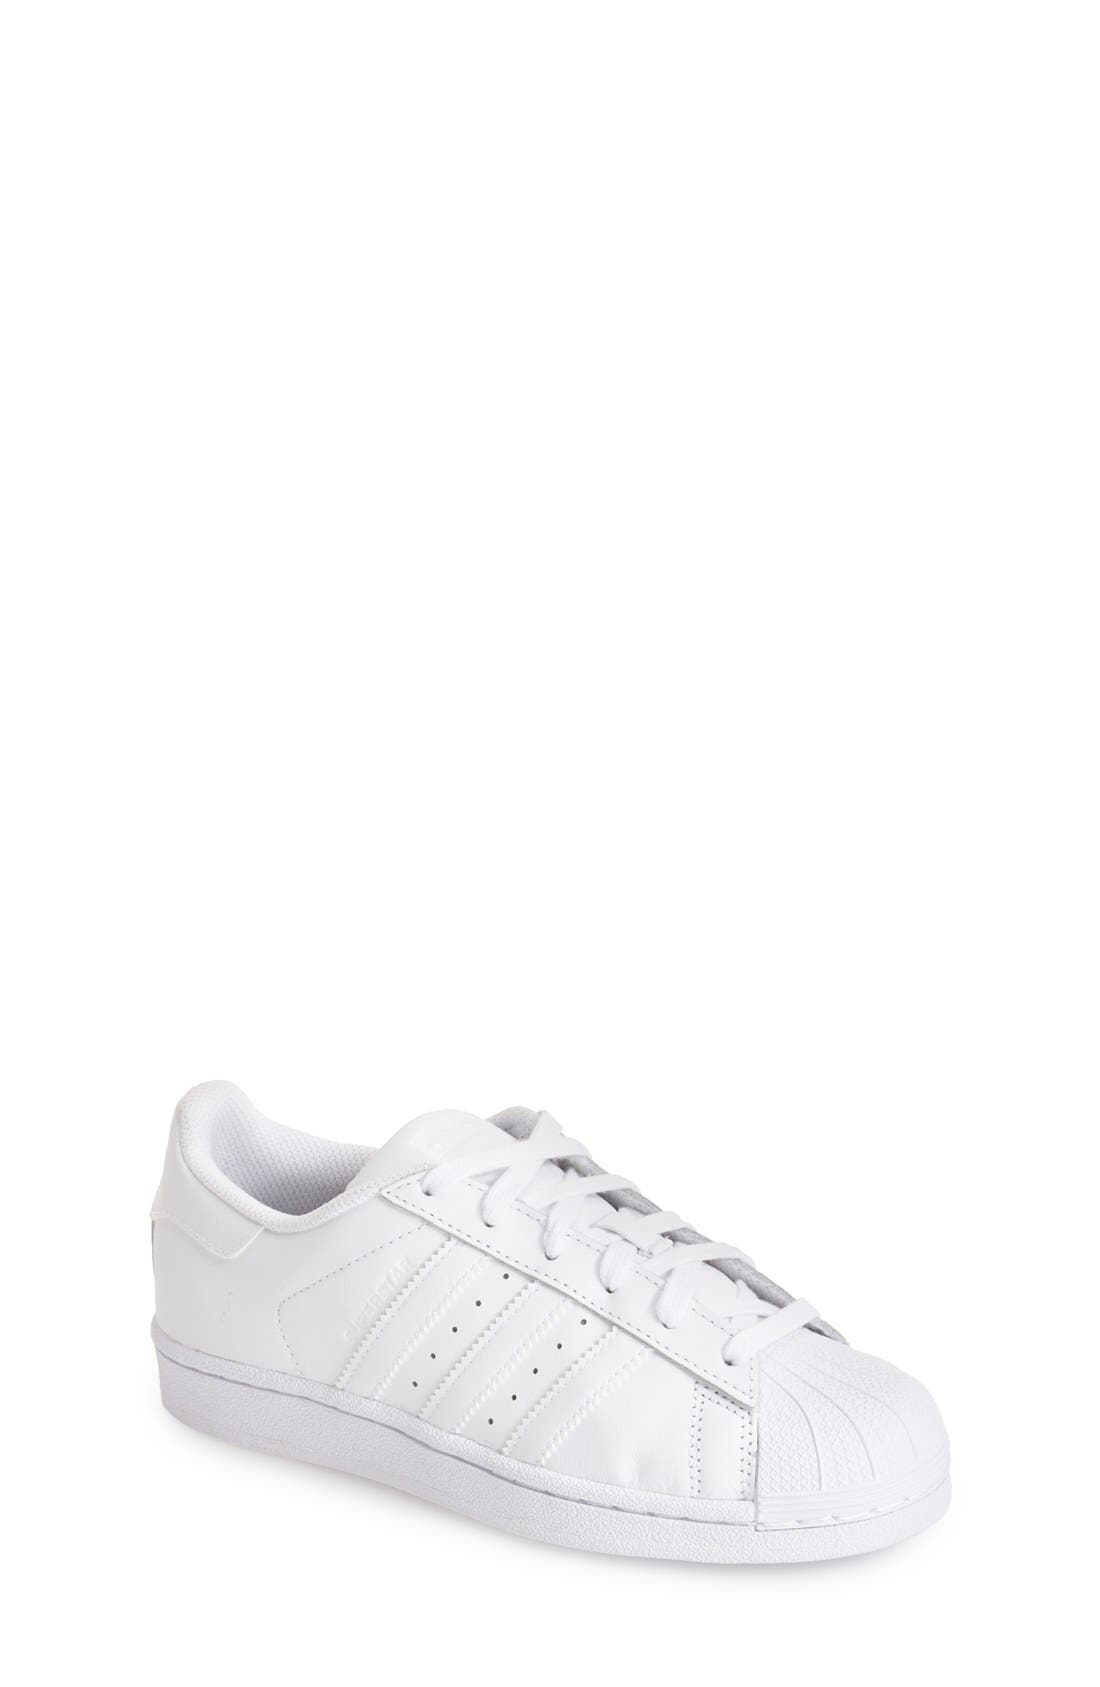 adidas \u0027Superstar 2\u0027 Sneaker (Big Kid)